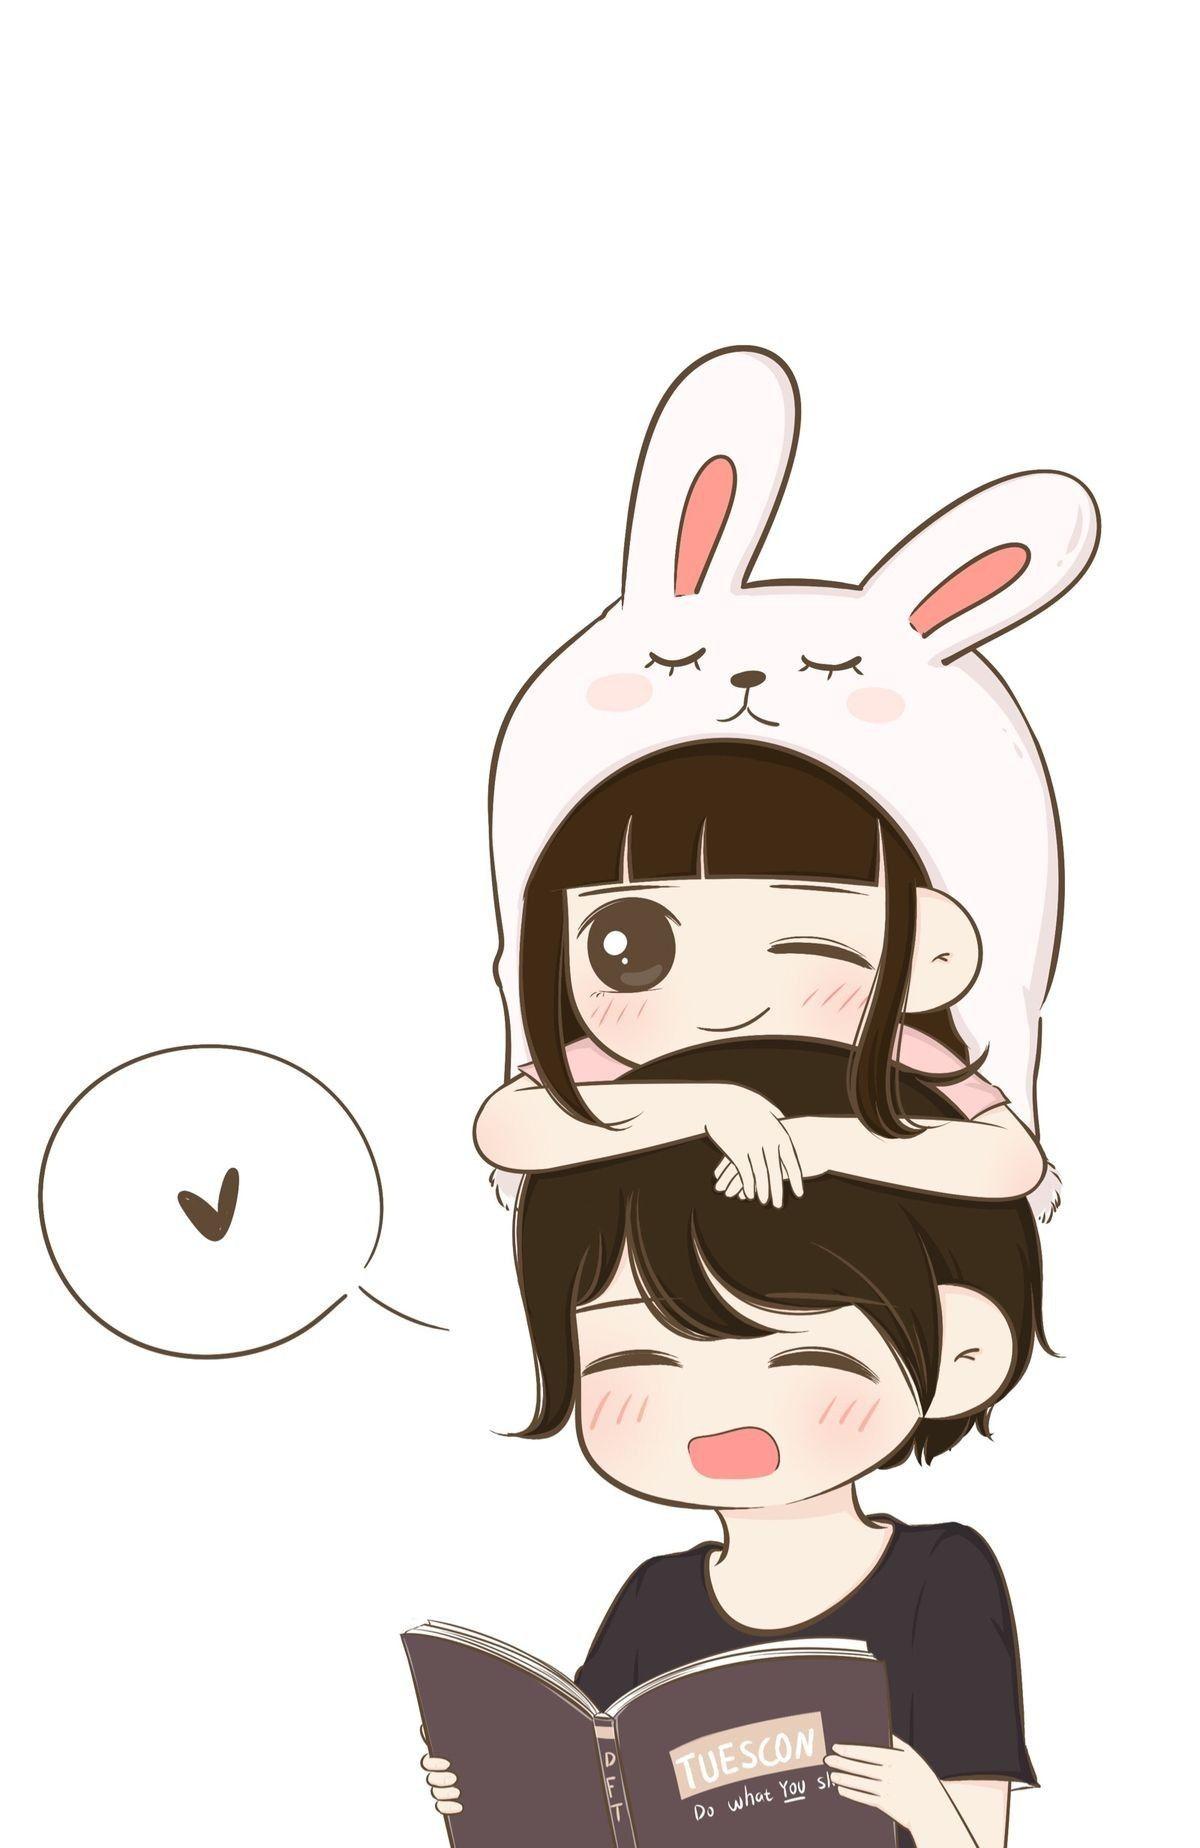 Pin by Erick Xuyá on anime Cute couple wallpaper, Cute